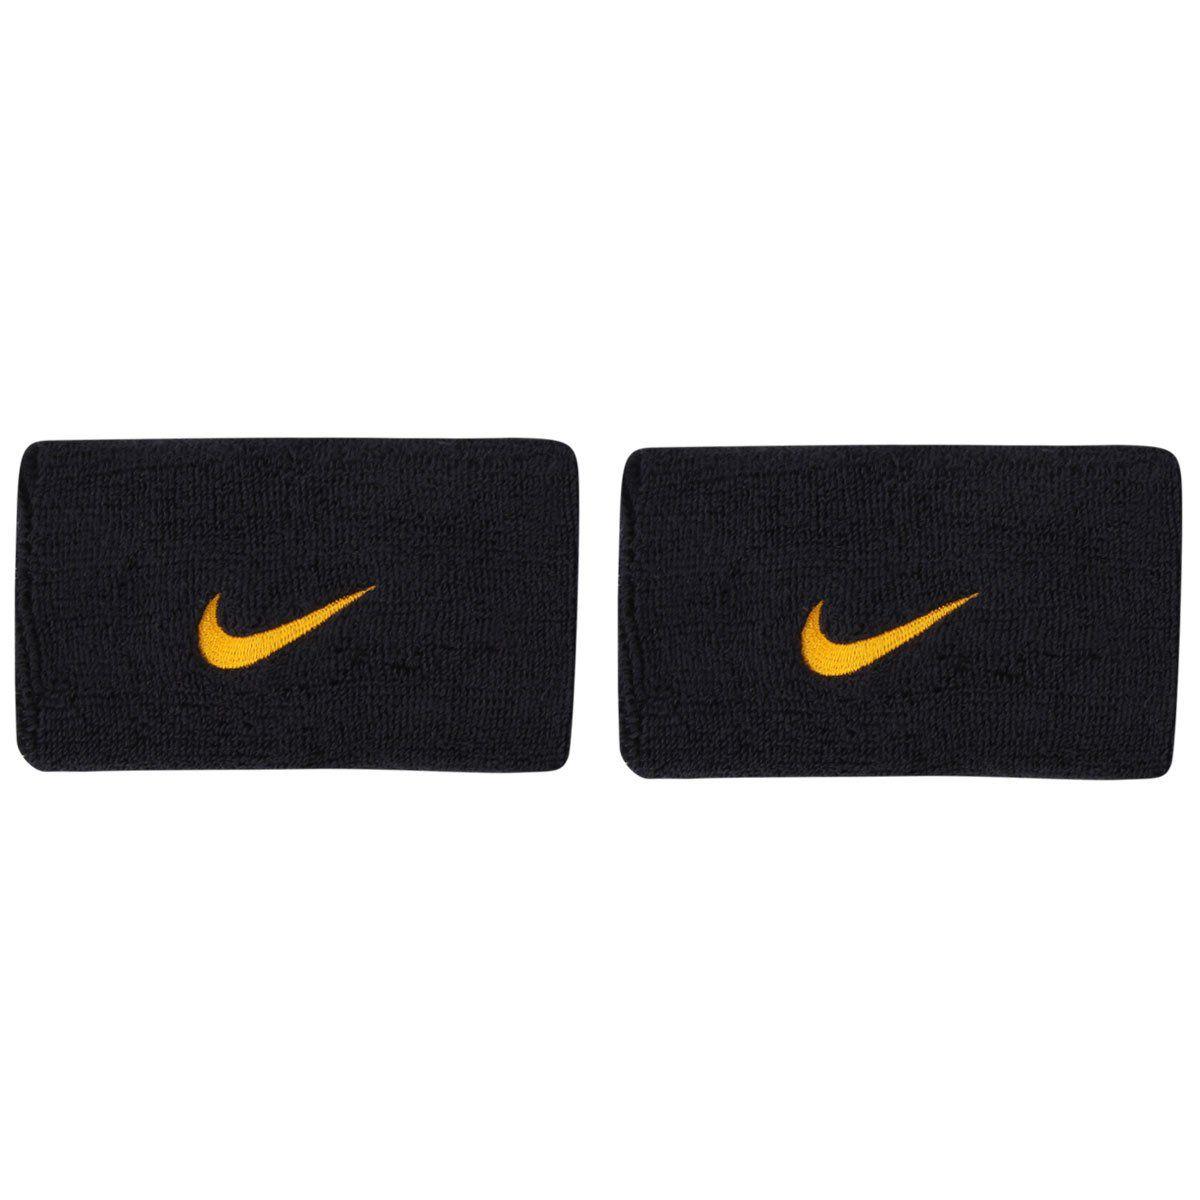 Munhequeira Swoosh double Wristband Nike - Marinho / Gold